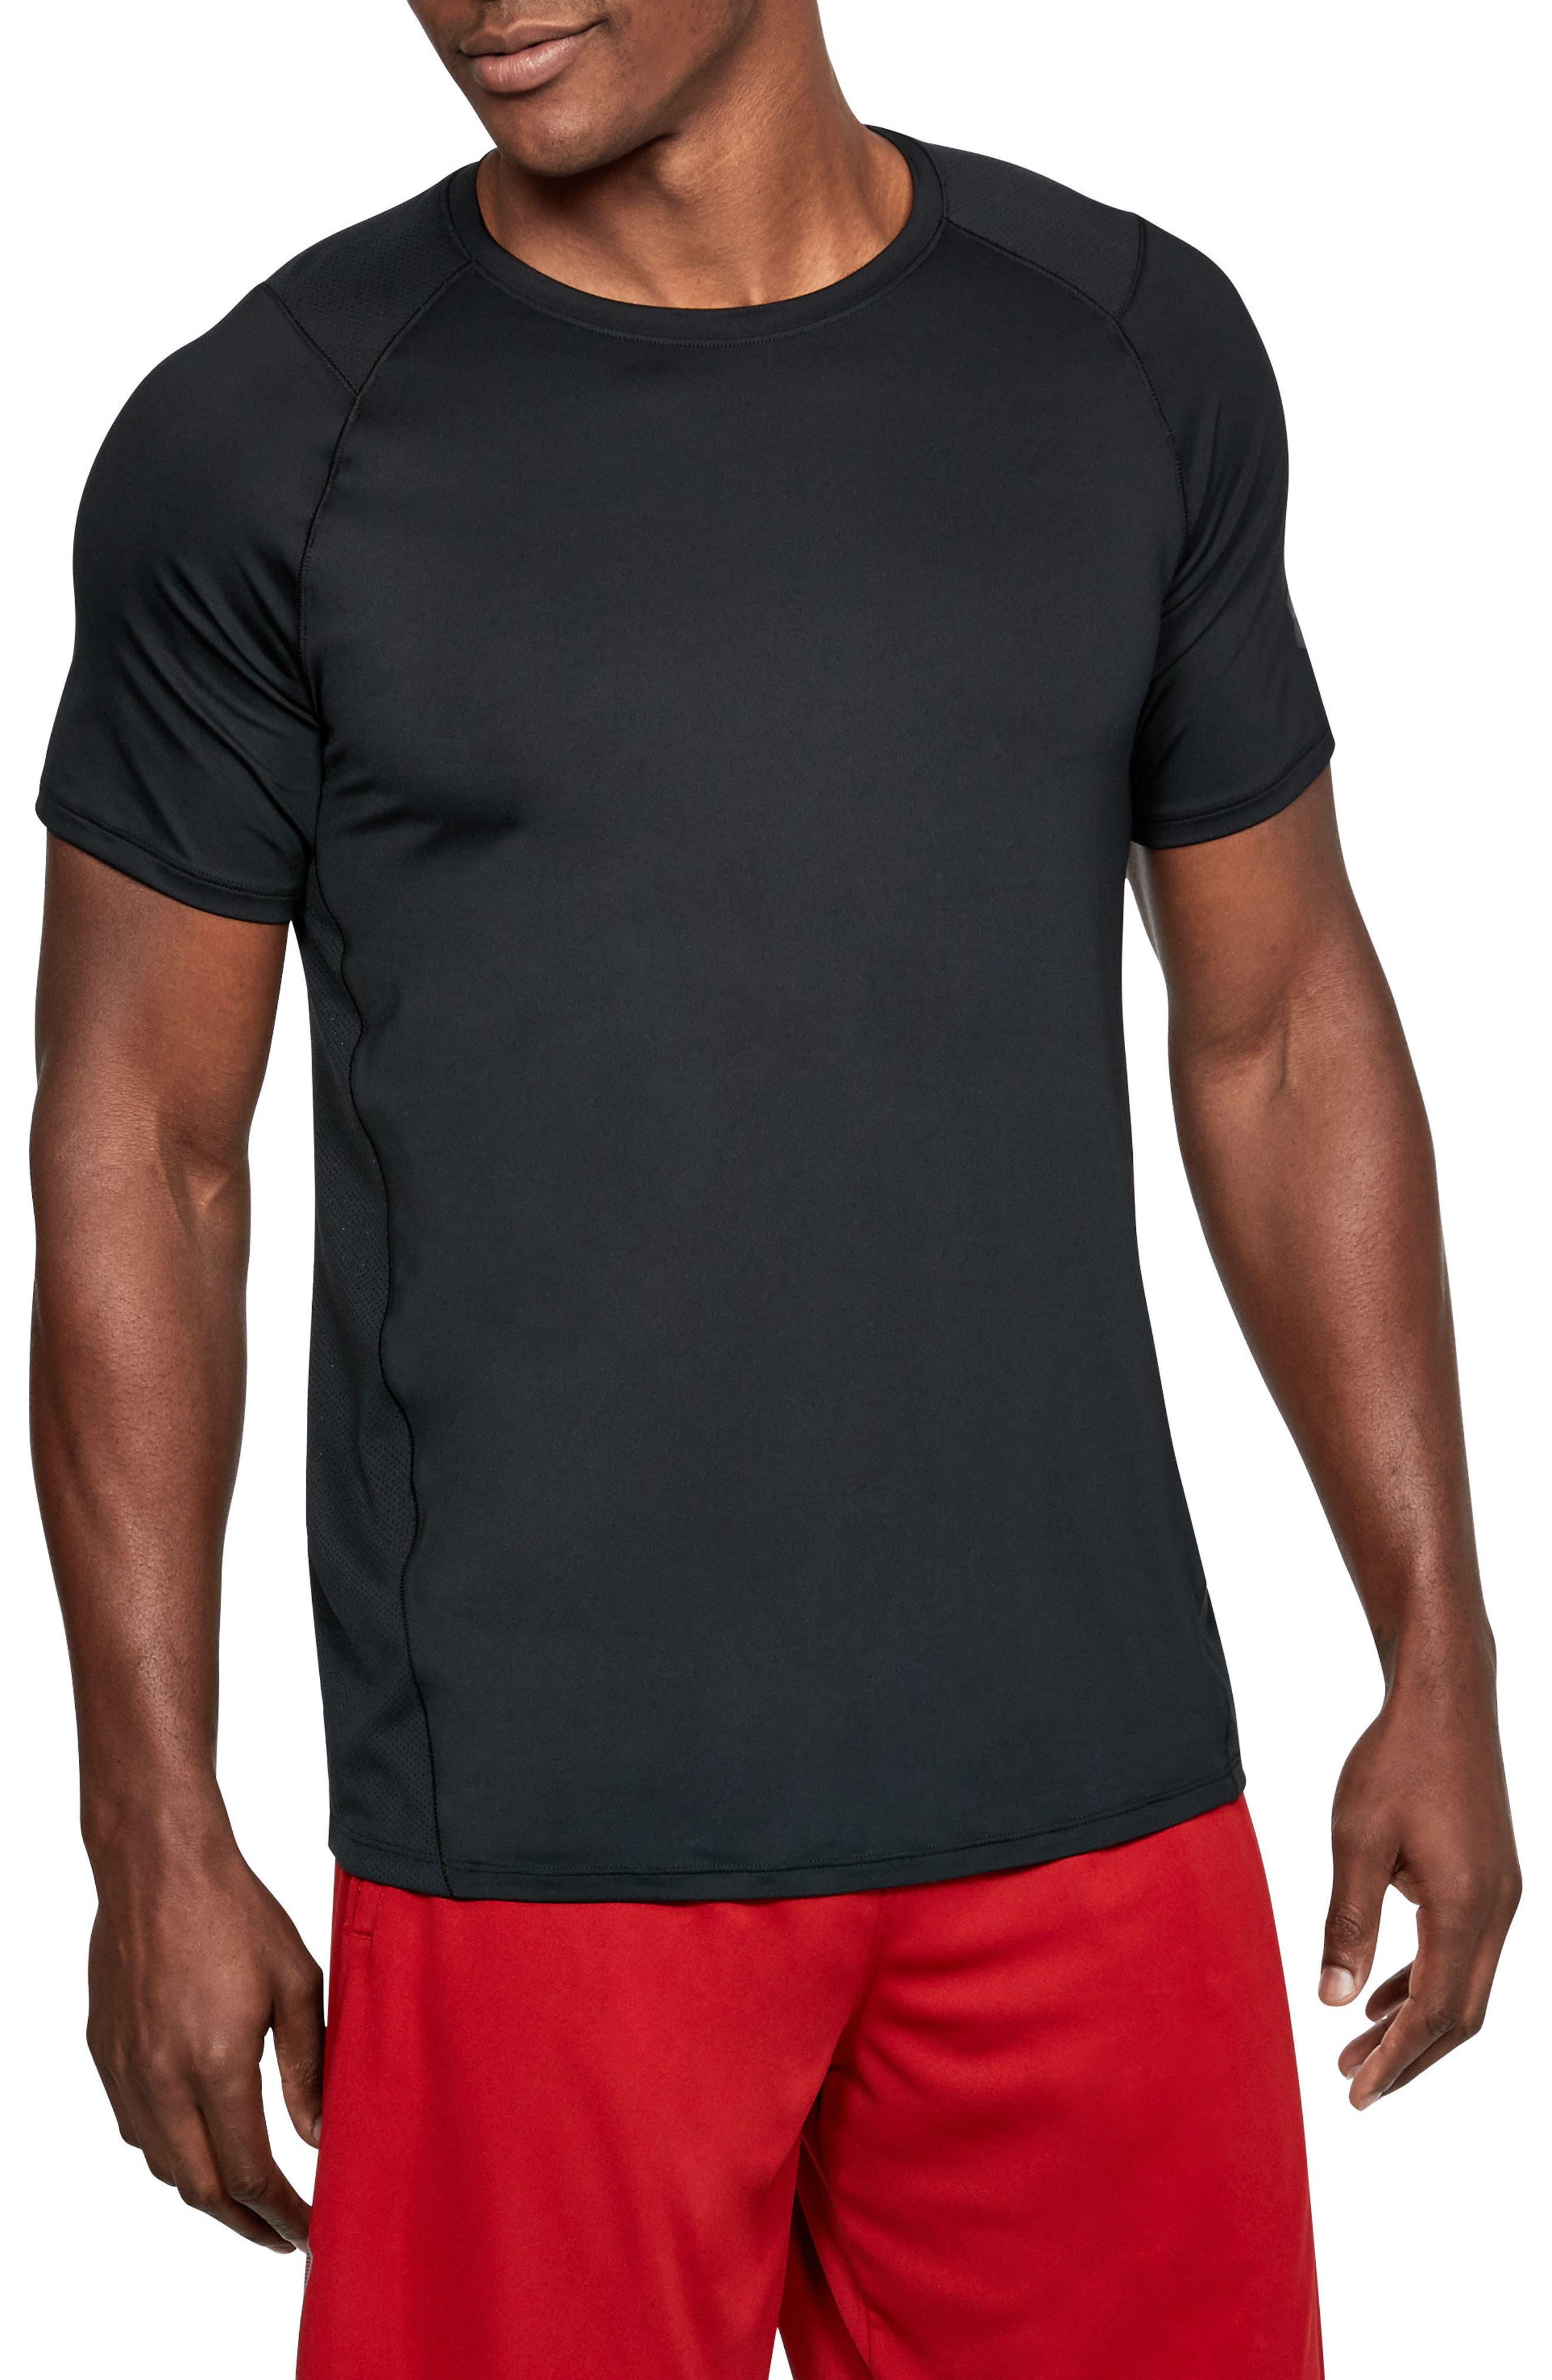 UNDER ARMOUR Raid 2.0 Crewneck T-Shirt, Main, color, 001